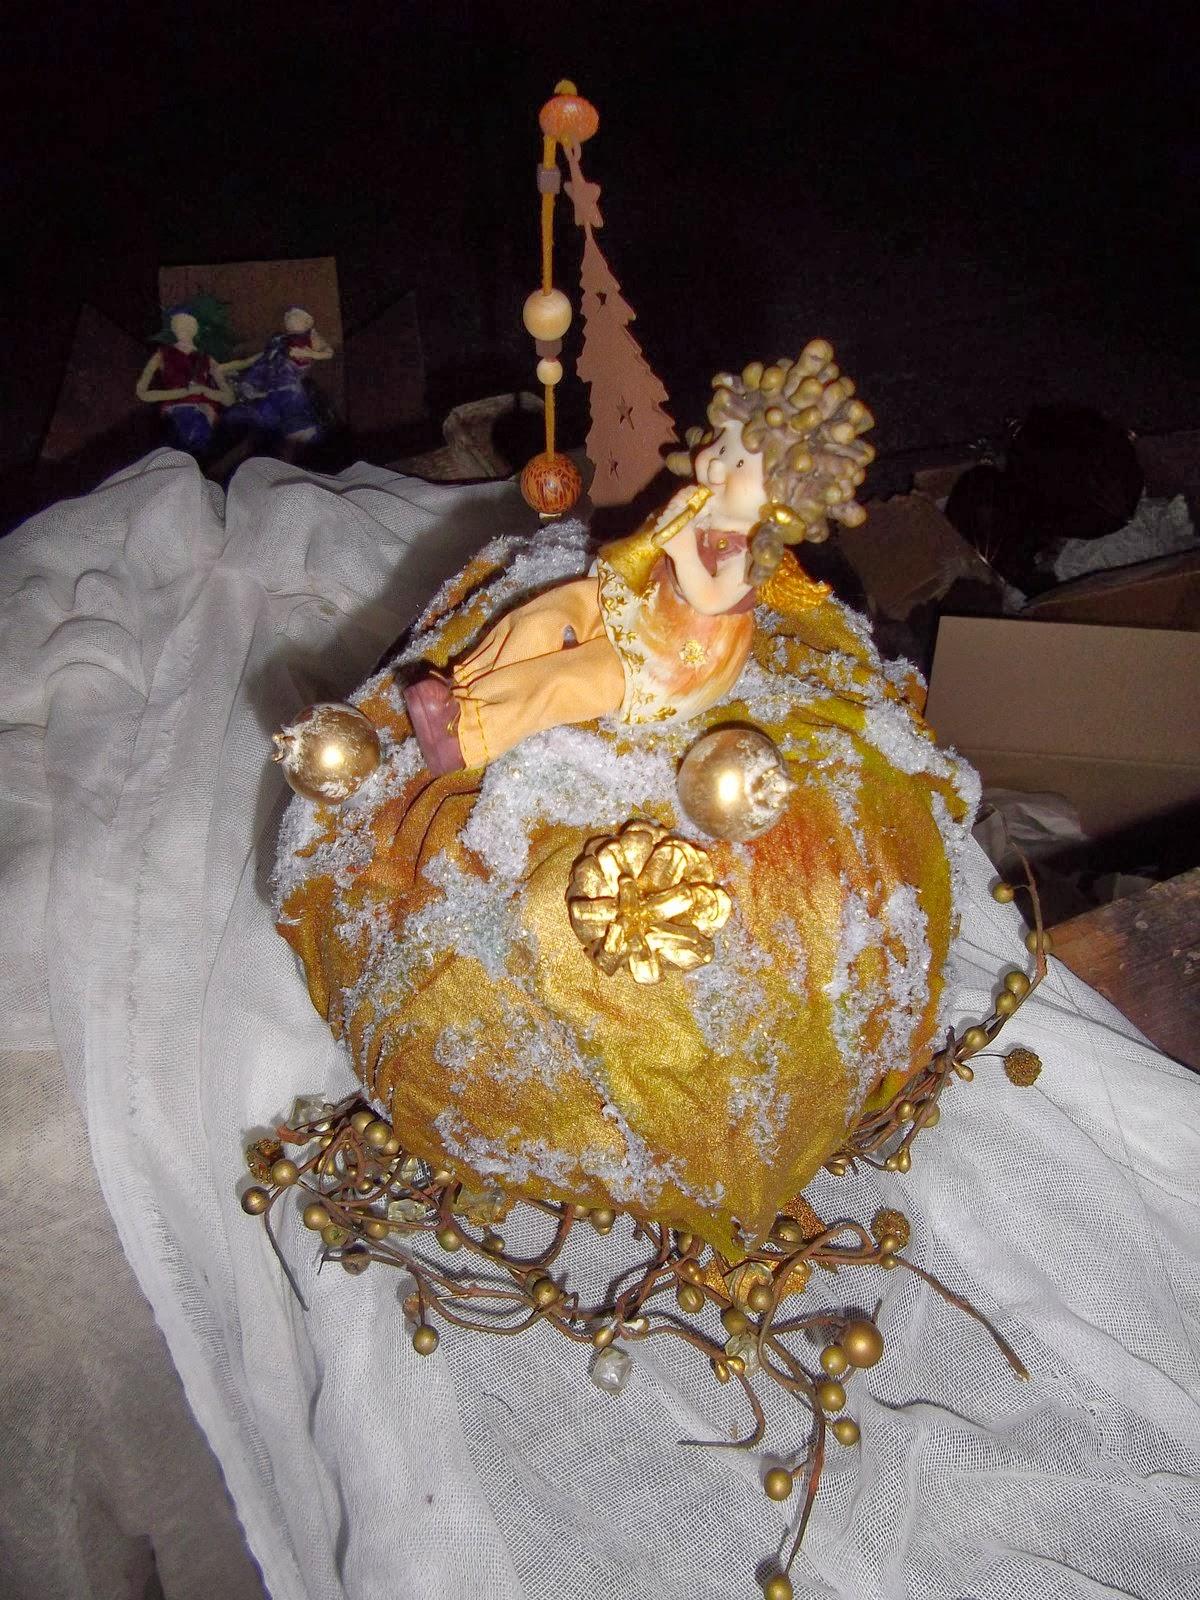 3b3d8c01895 Amanda's Handmade Creations: Χριστουγεννιάτικη επιτραπέζια μπάλα ...